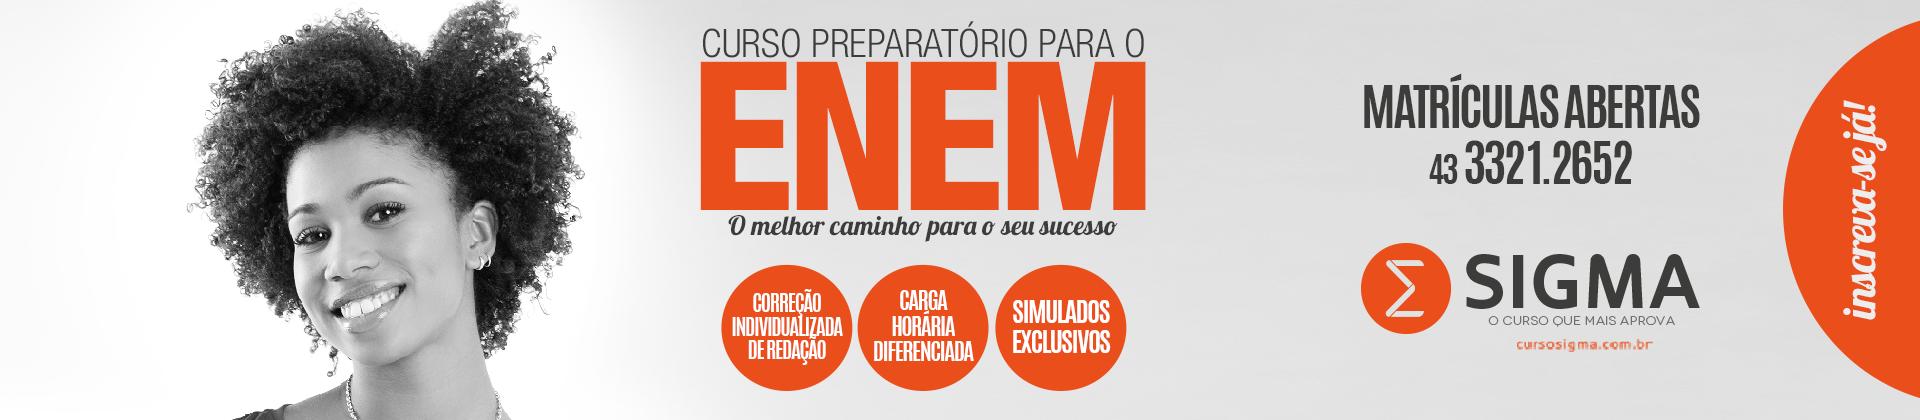 Campanha ENEM